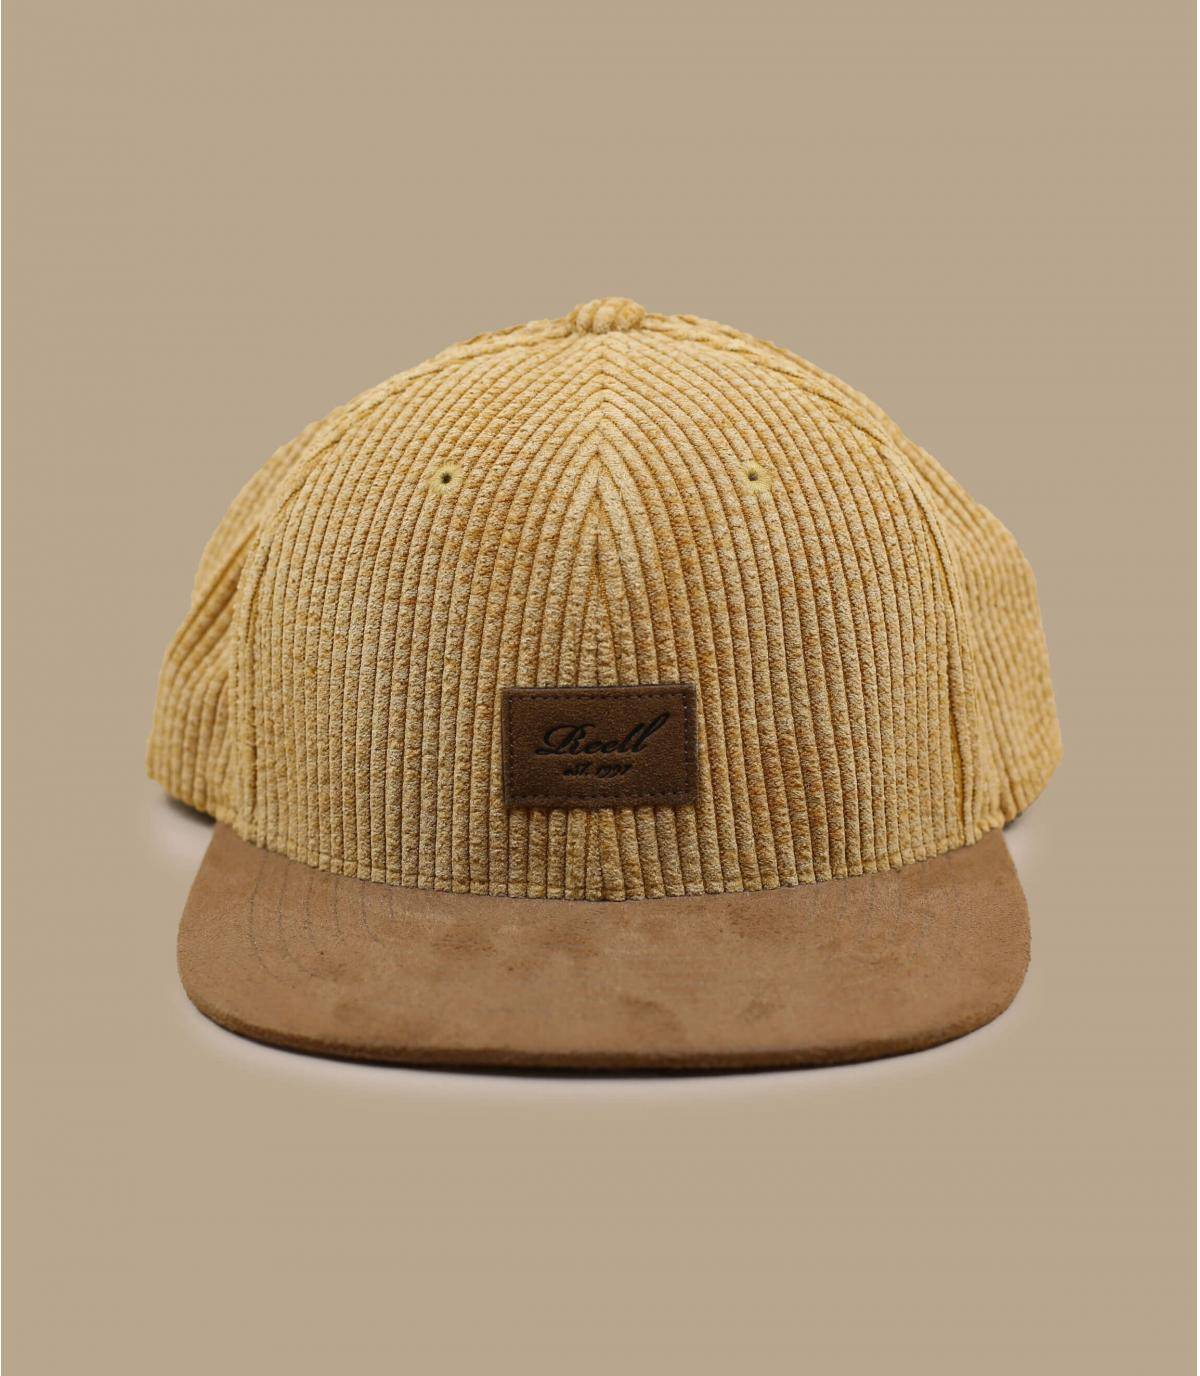 Dettagli Suede Cap Cord beige - image 2